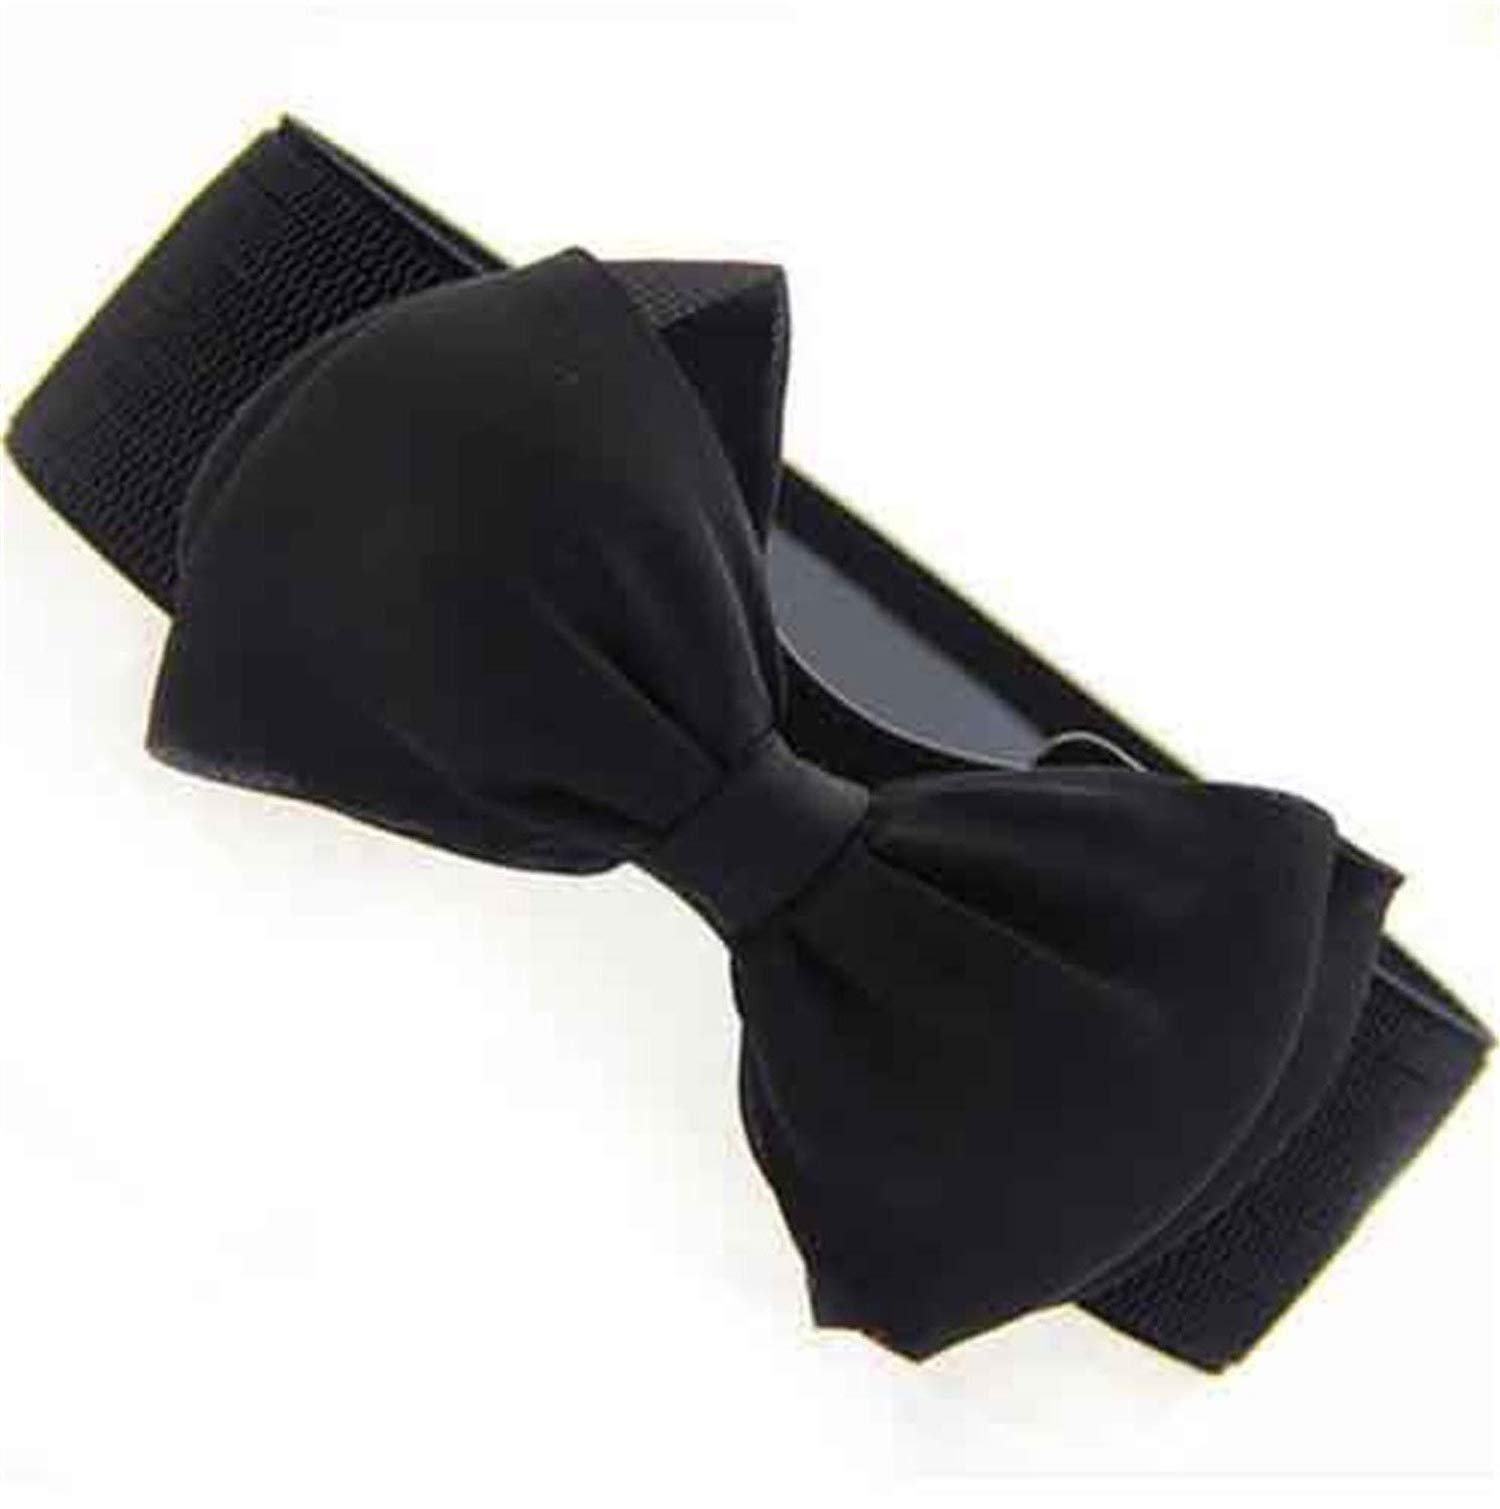 Beautface Makeup Nice Fashion Women Lady Bowknot Stretch Elastic Bow Wide Stretch Buckle Waistband Waist Belt,OneSize,Black